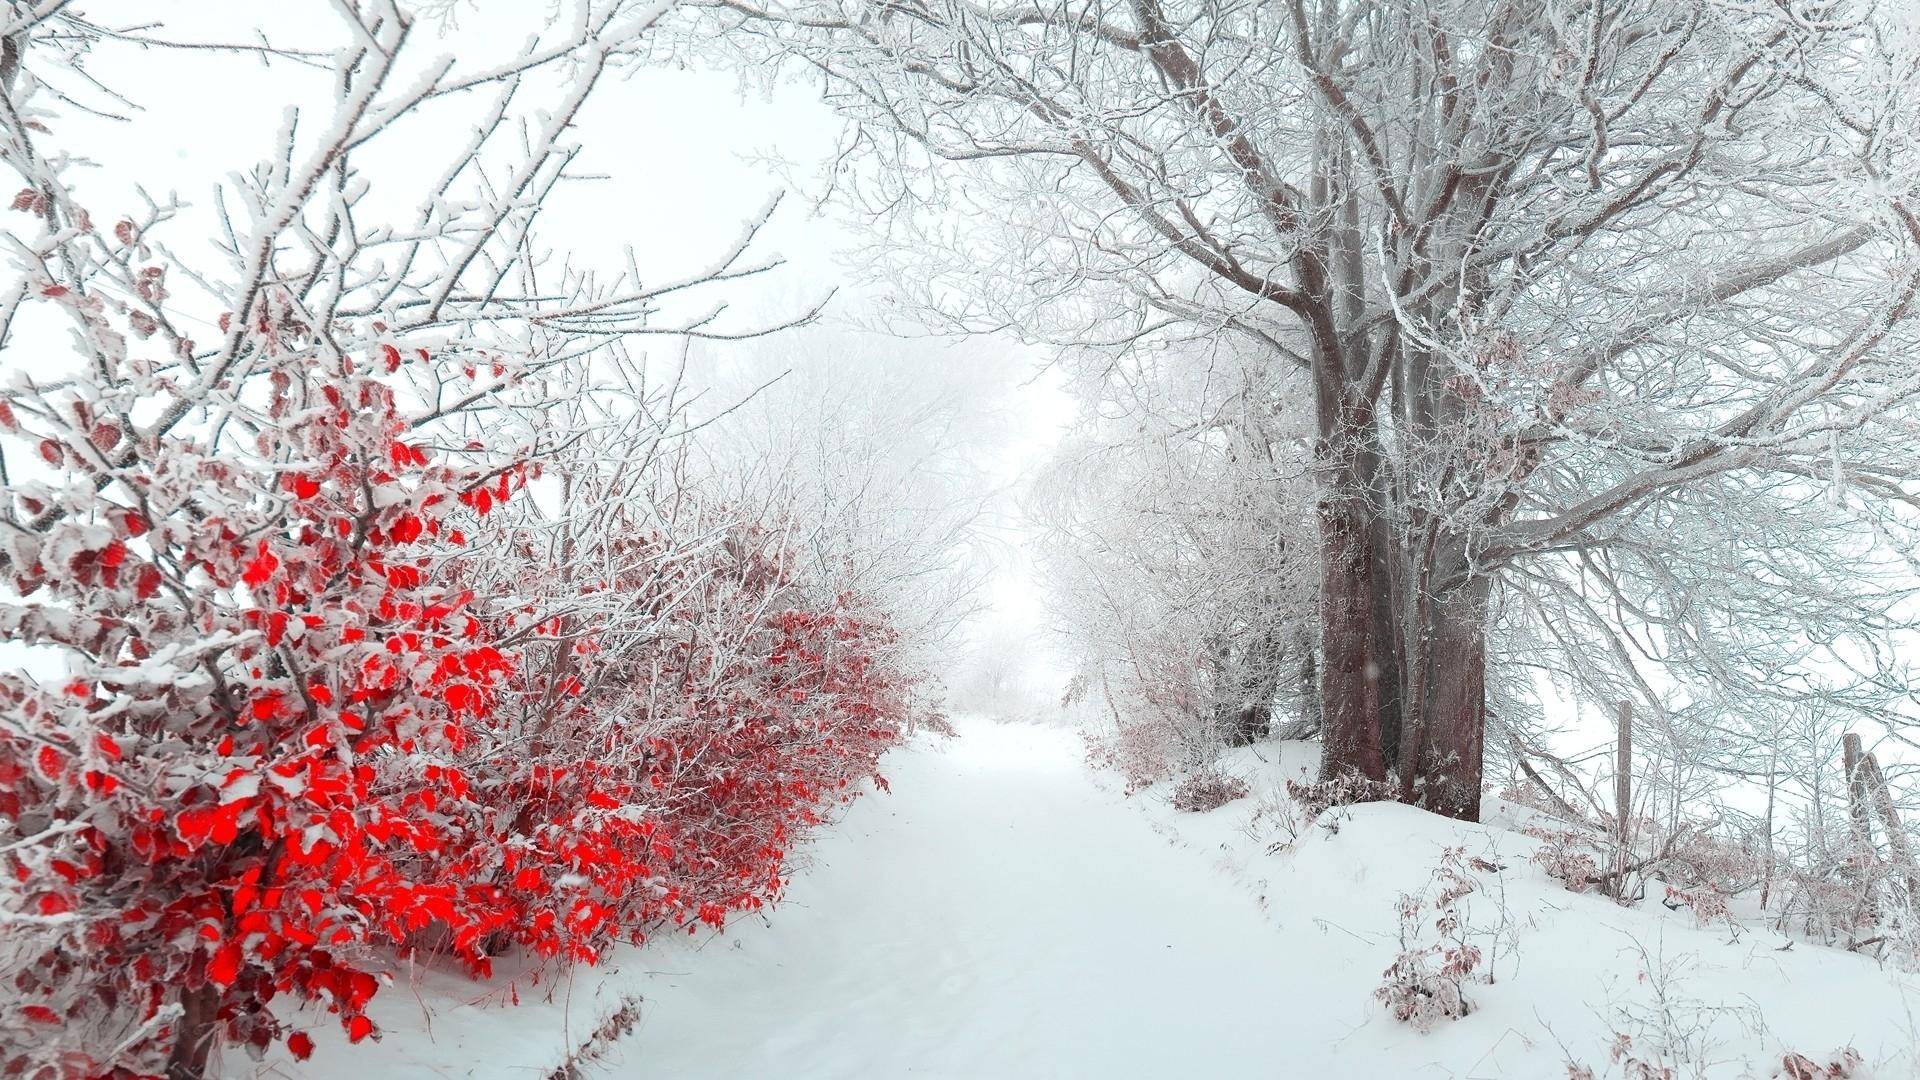 winter flowers 25811 1920x1080 px ~ hdwallsource